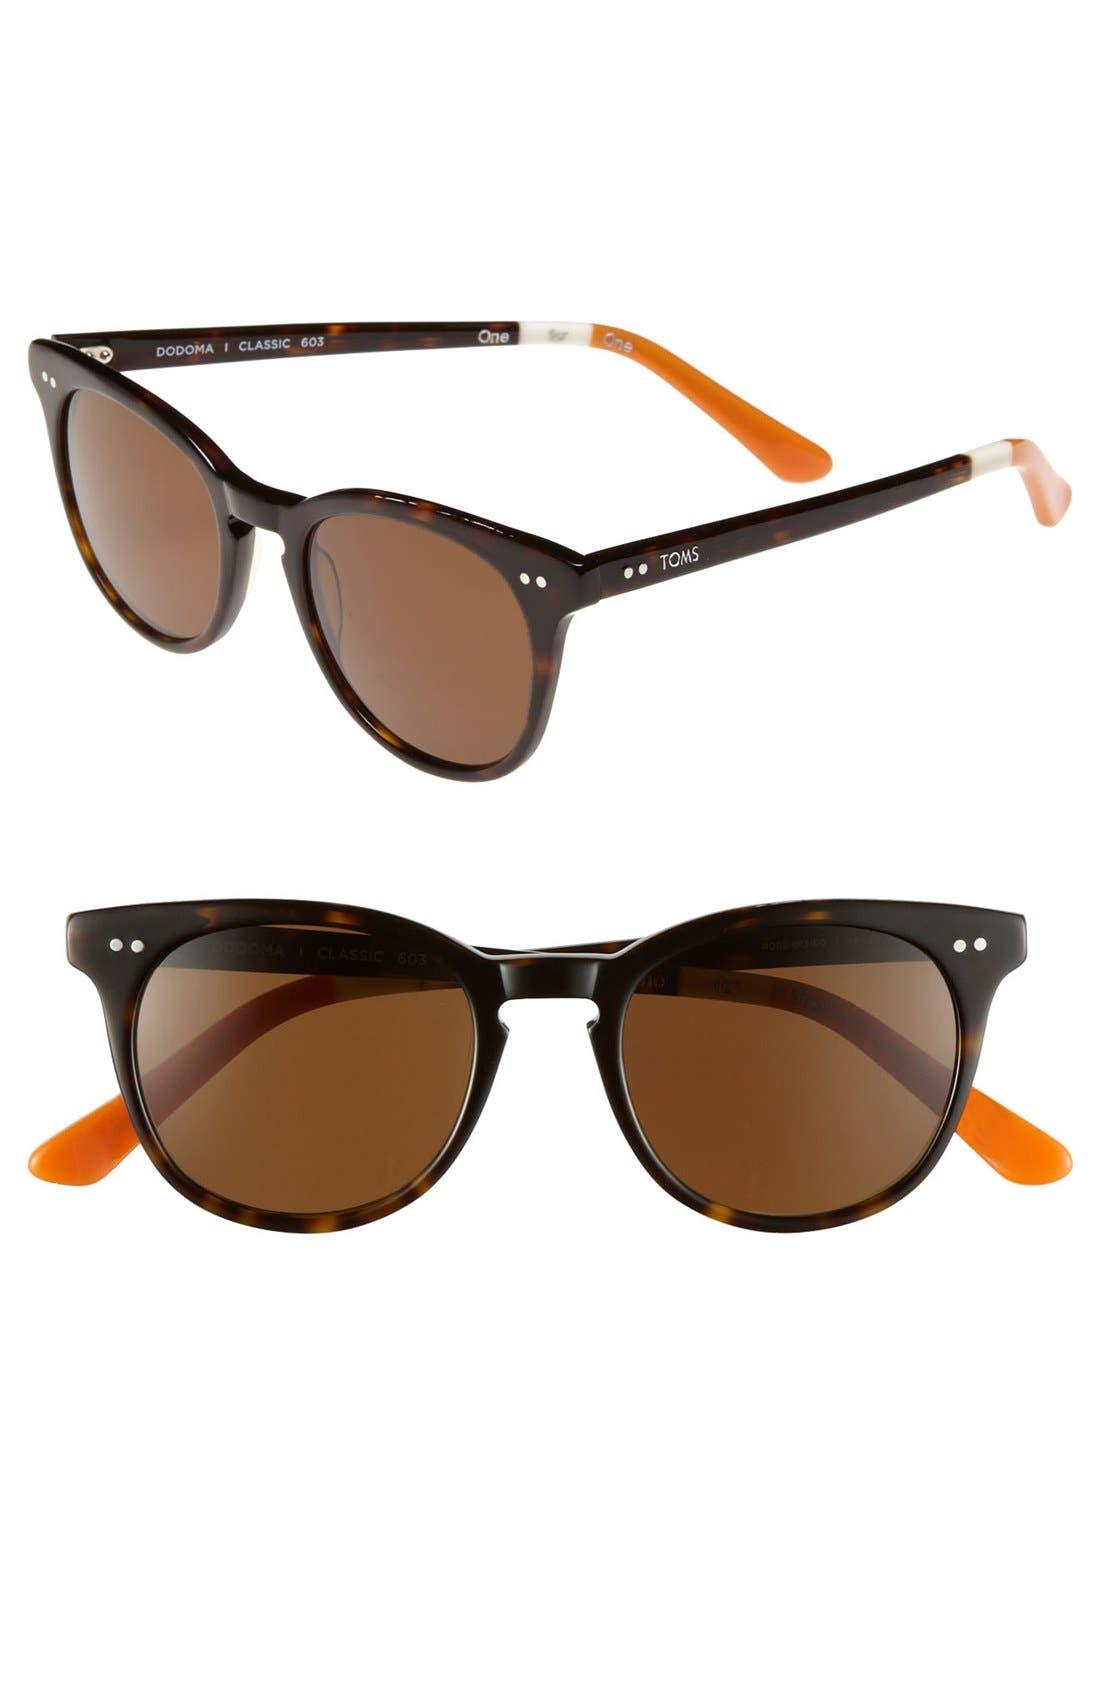 Main Image - TOMS 'Dodoma - Classic 603' Polarized 48mm Sunglasses